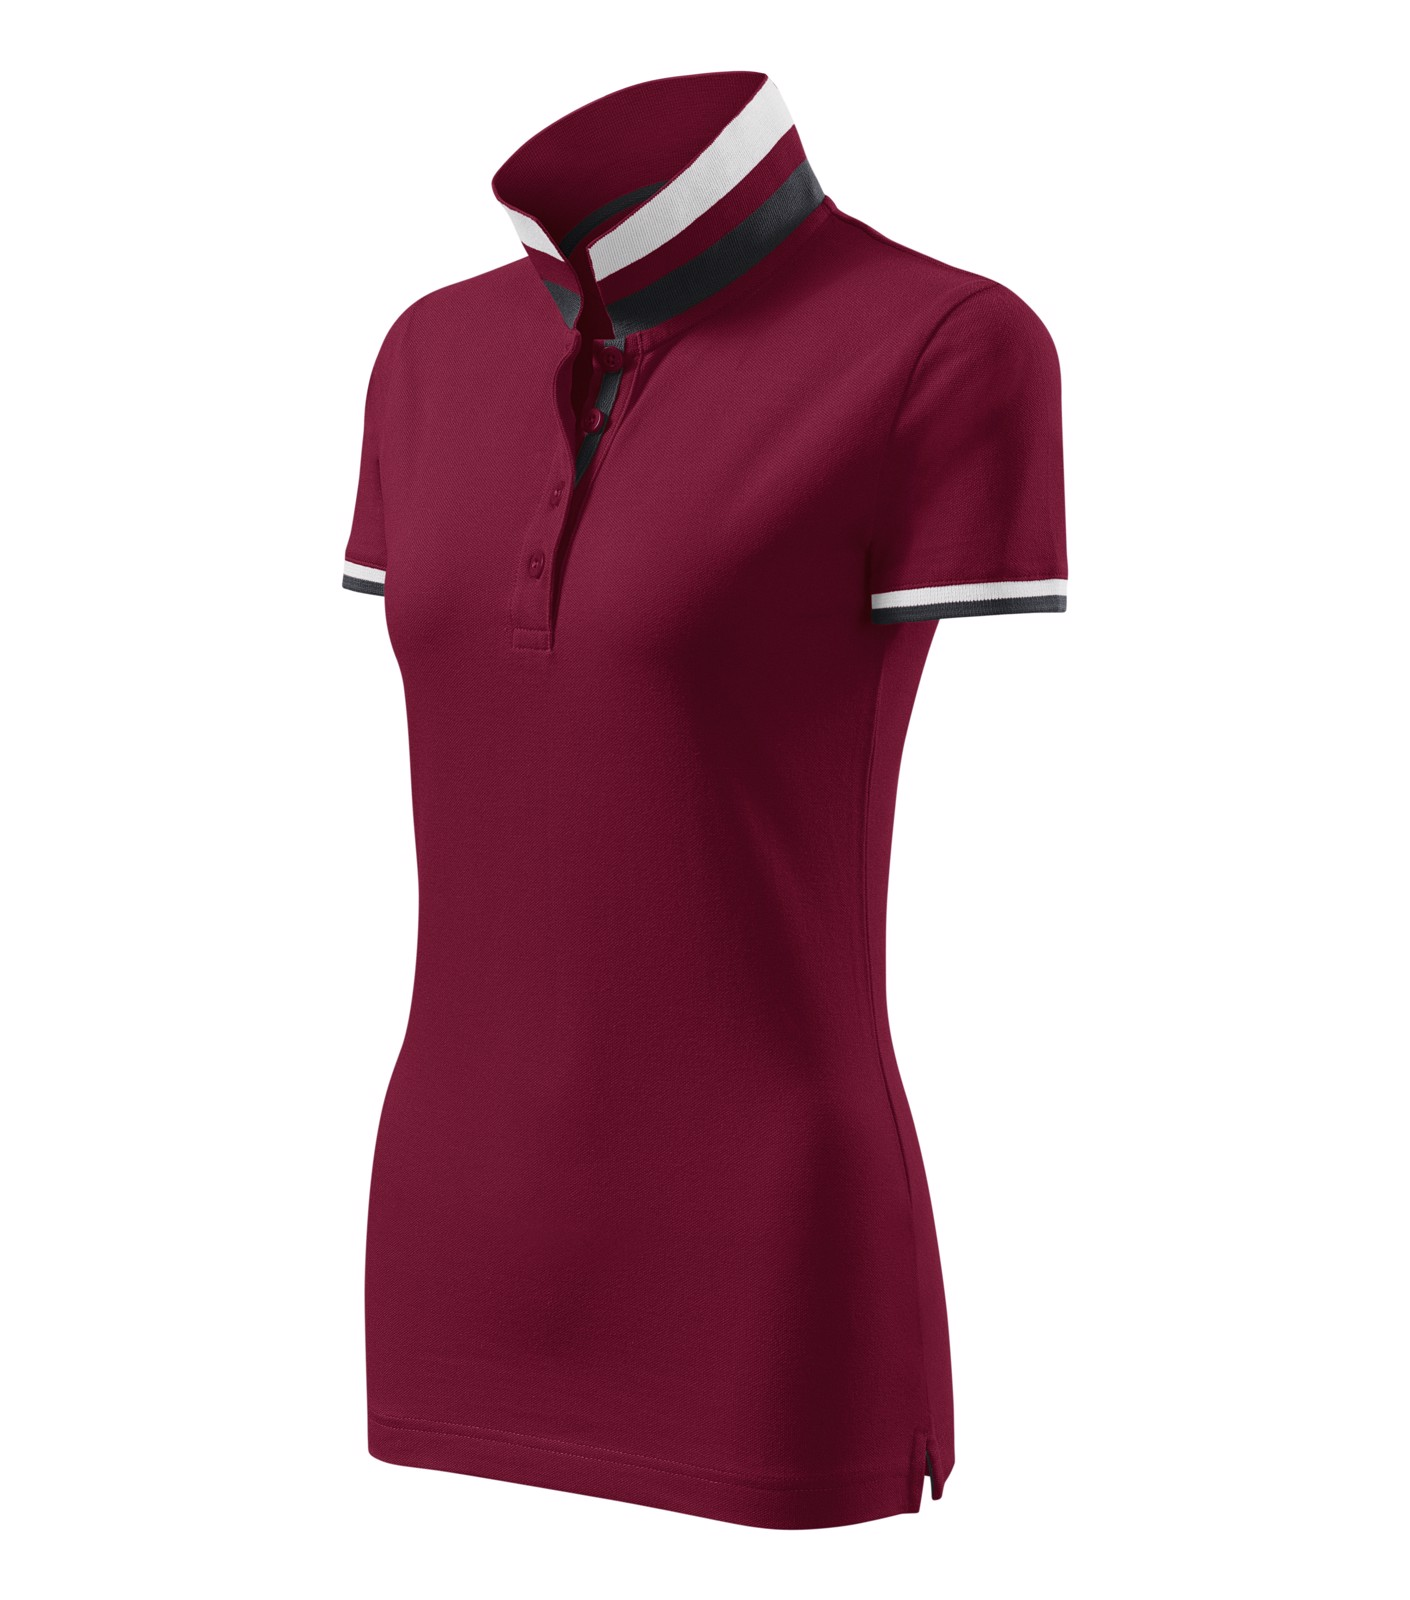 Polokošile dámská Malfinipremium Collar Up - Garnet / S